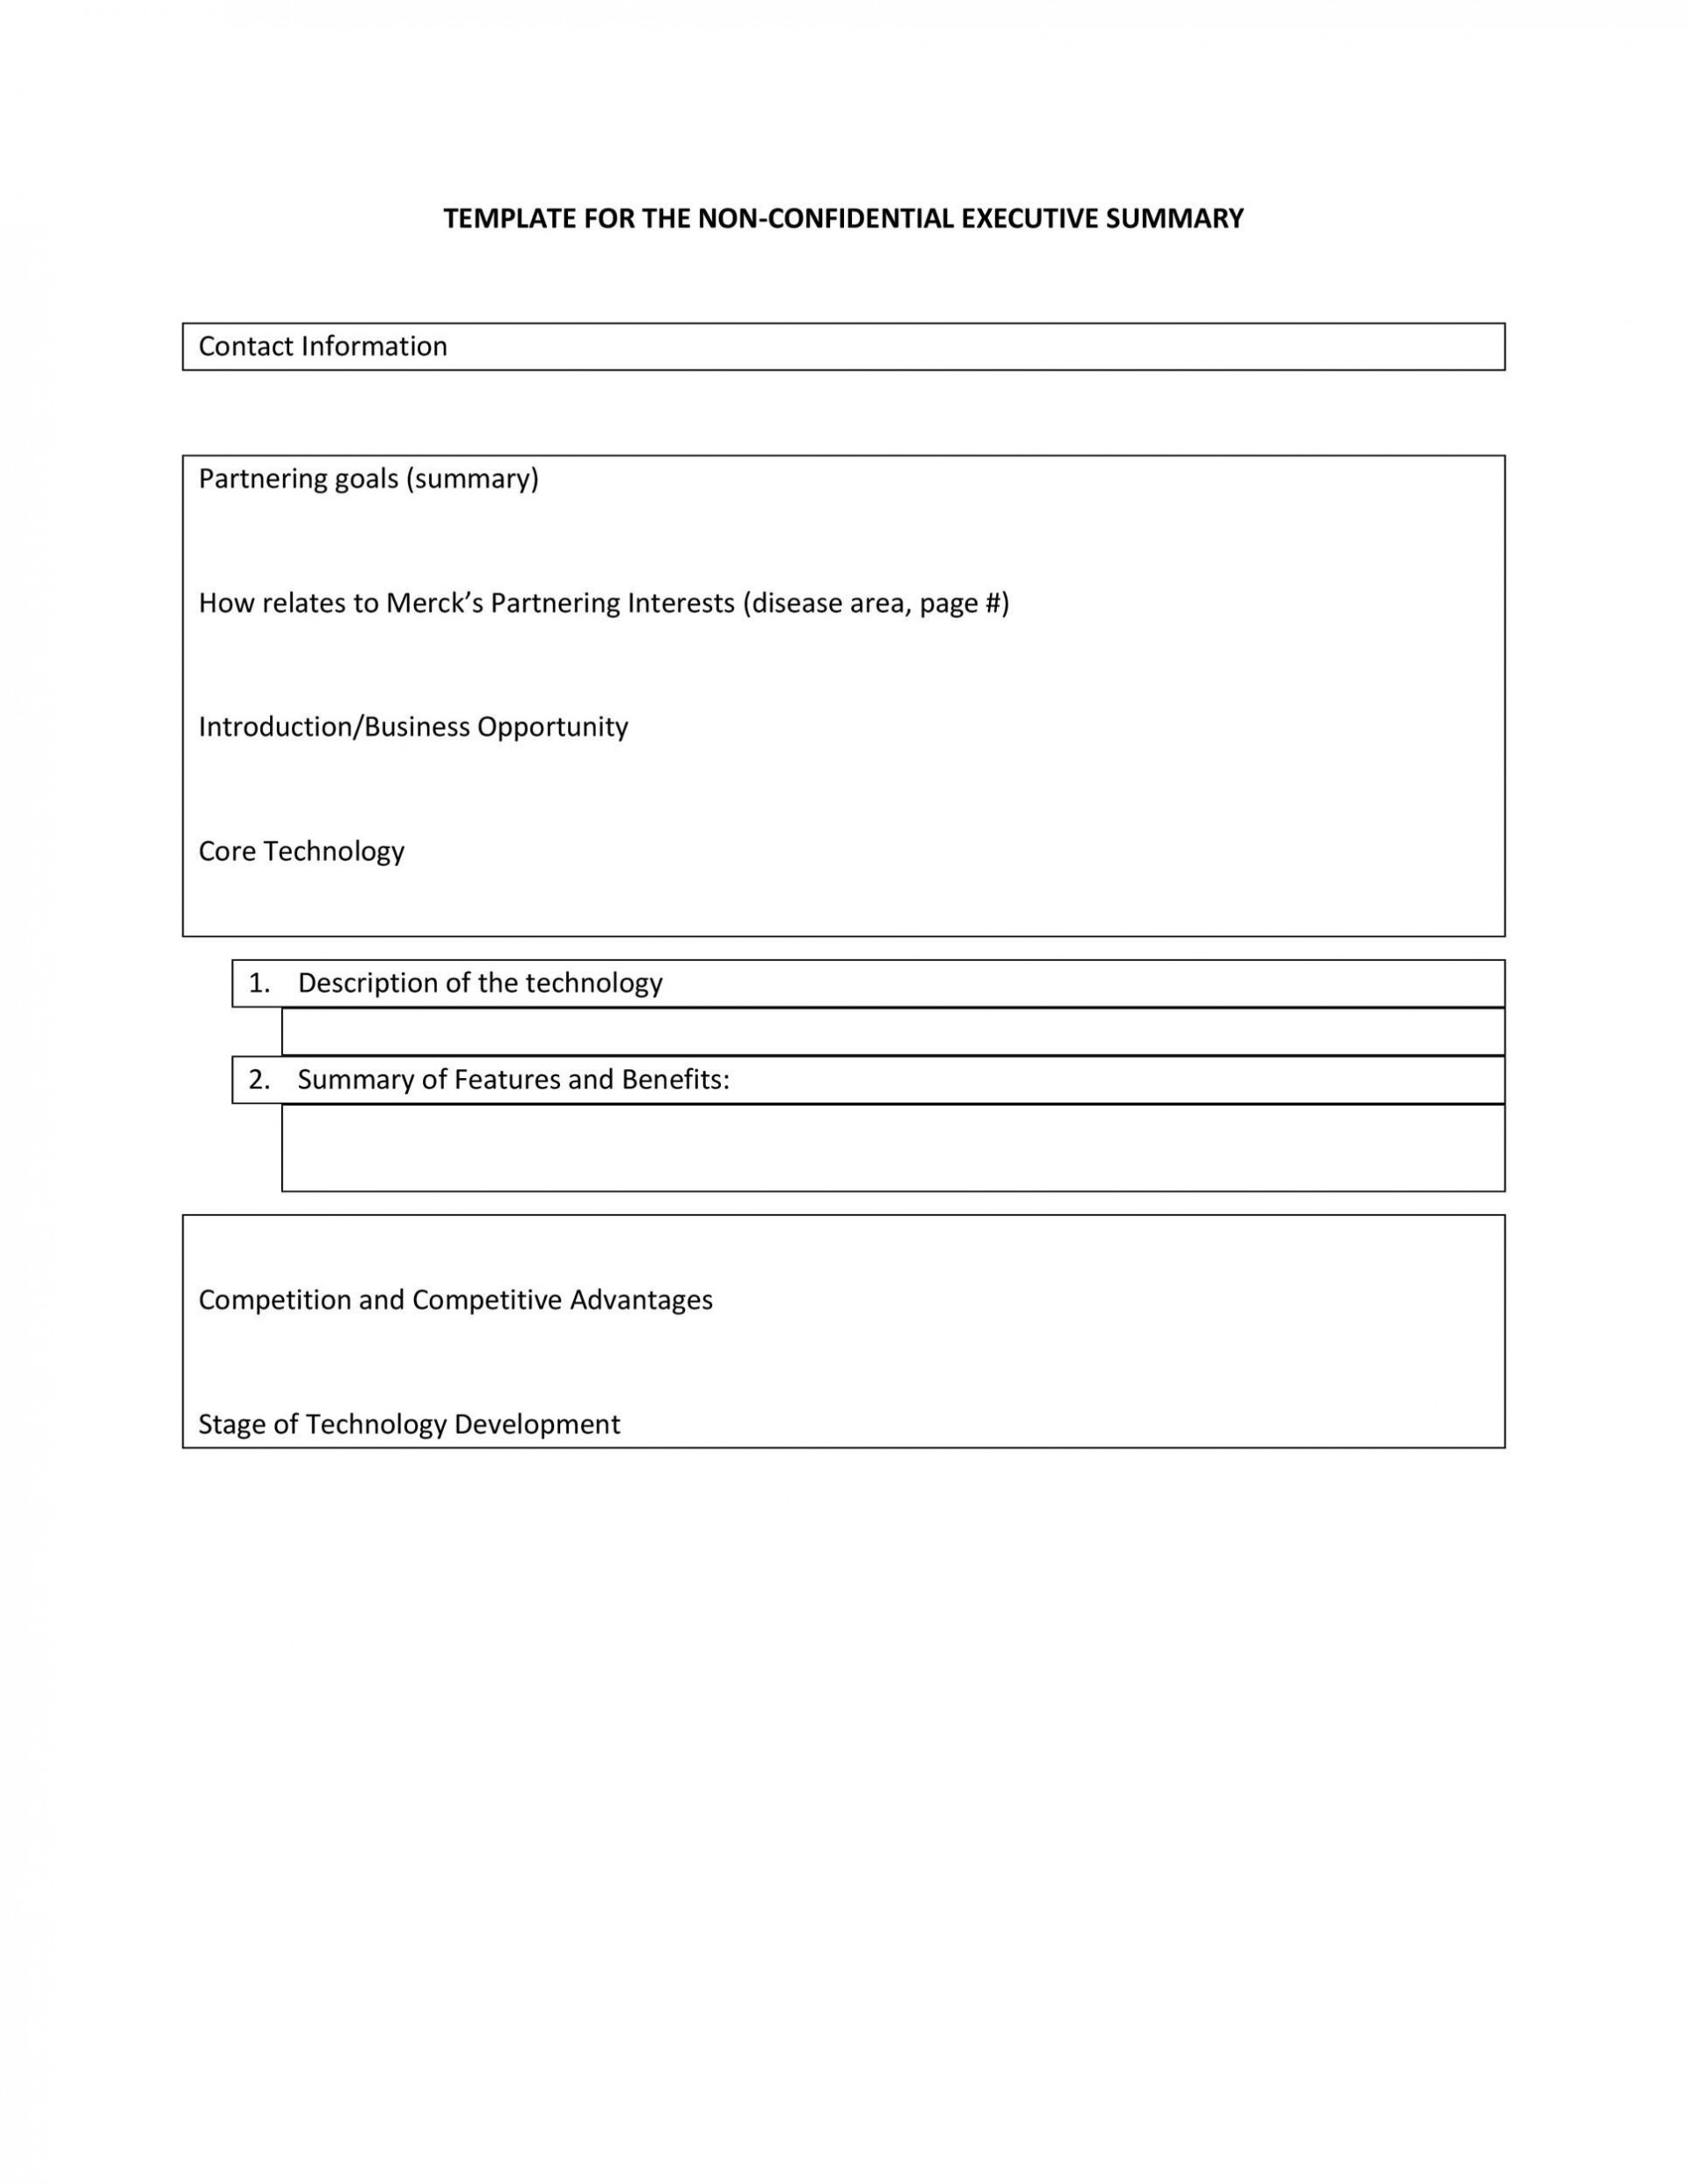 005 Phenomenal Executive Summary Report Word Template Example 1920